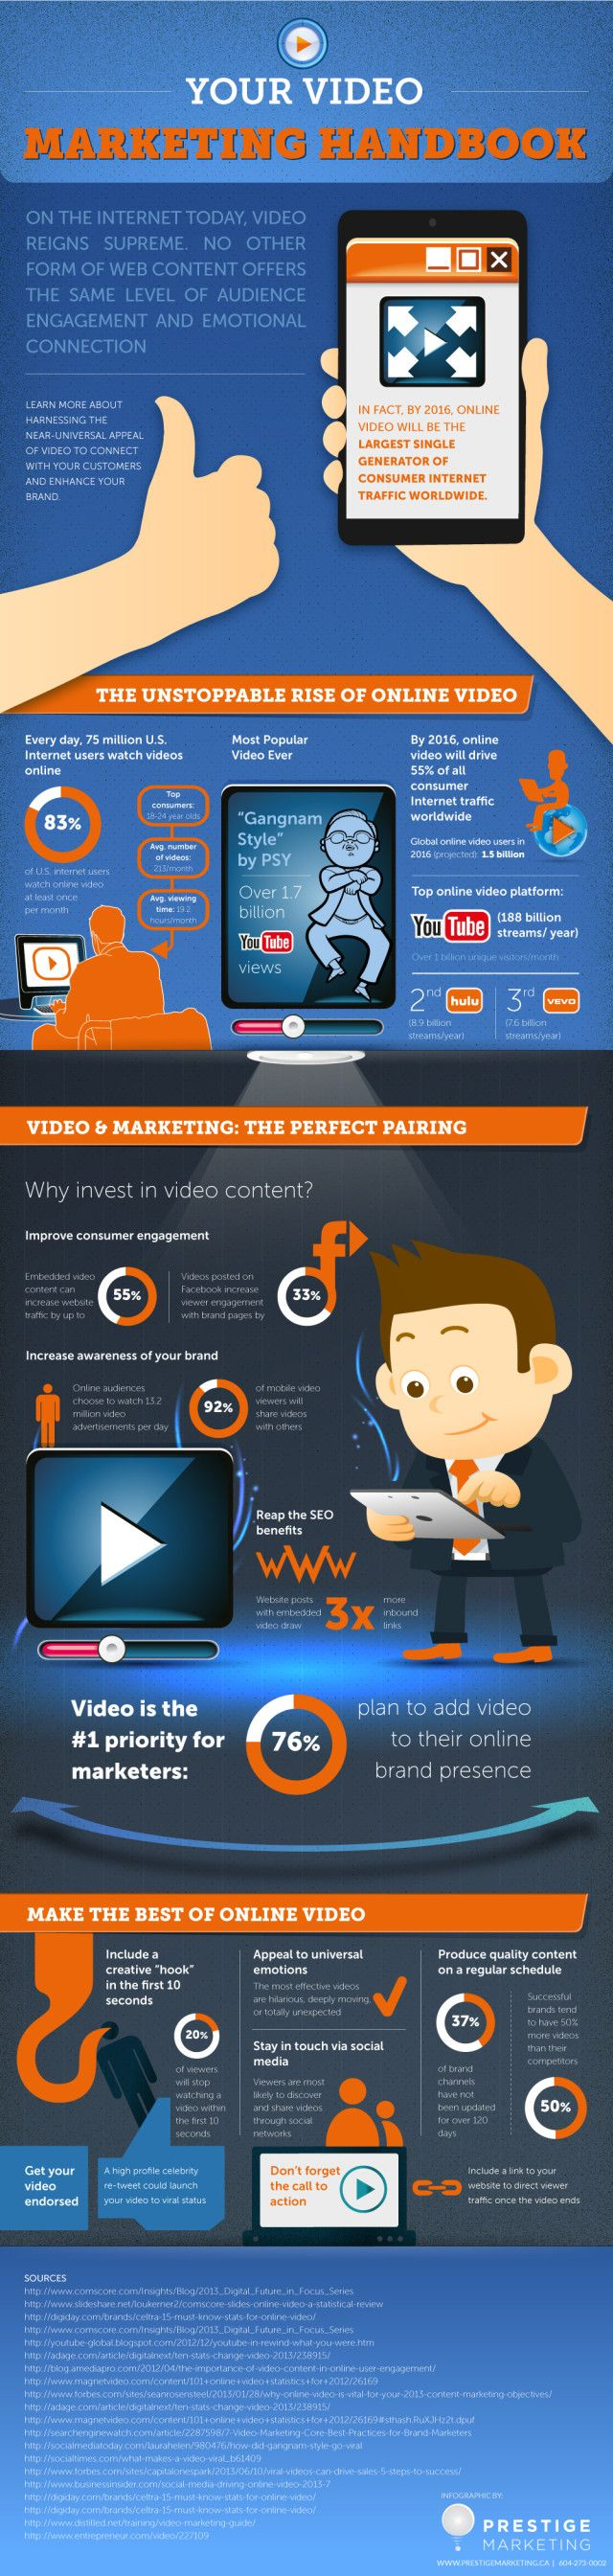 Your #Video #Marketing Handbook. http://www.clipforce.nl/ #socialmedia #ads #adverteren #videomarketing #videoproductie #videocontent #video #onlinevideo #marketing #infographic